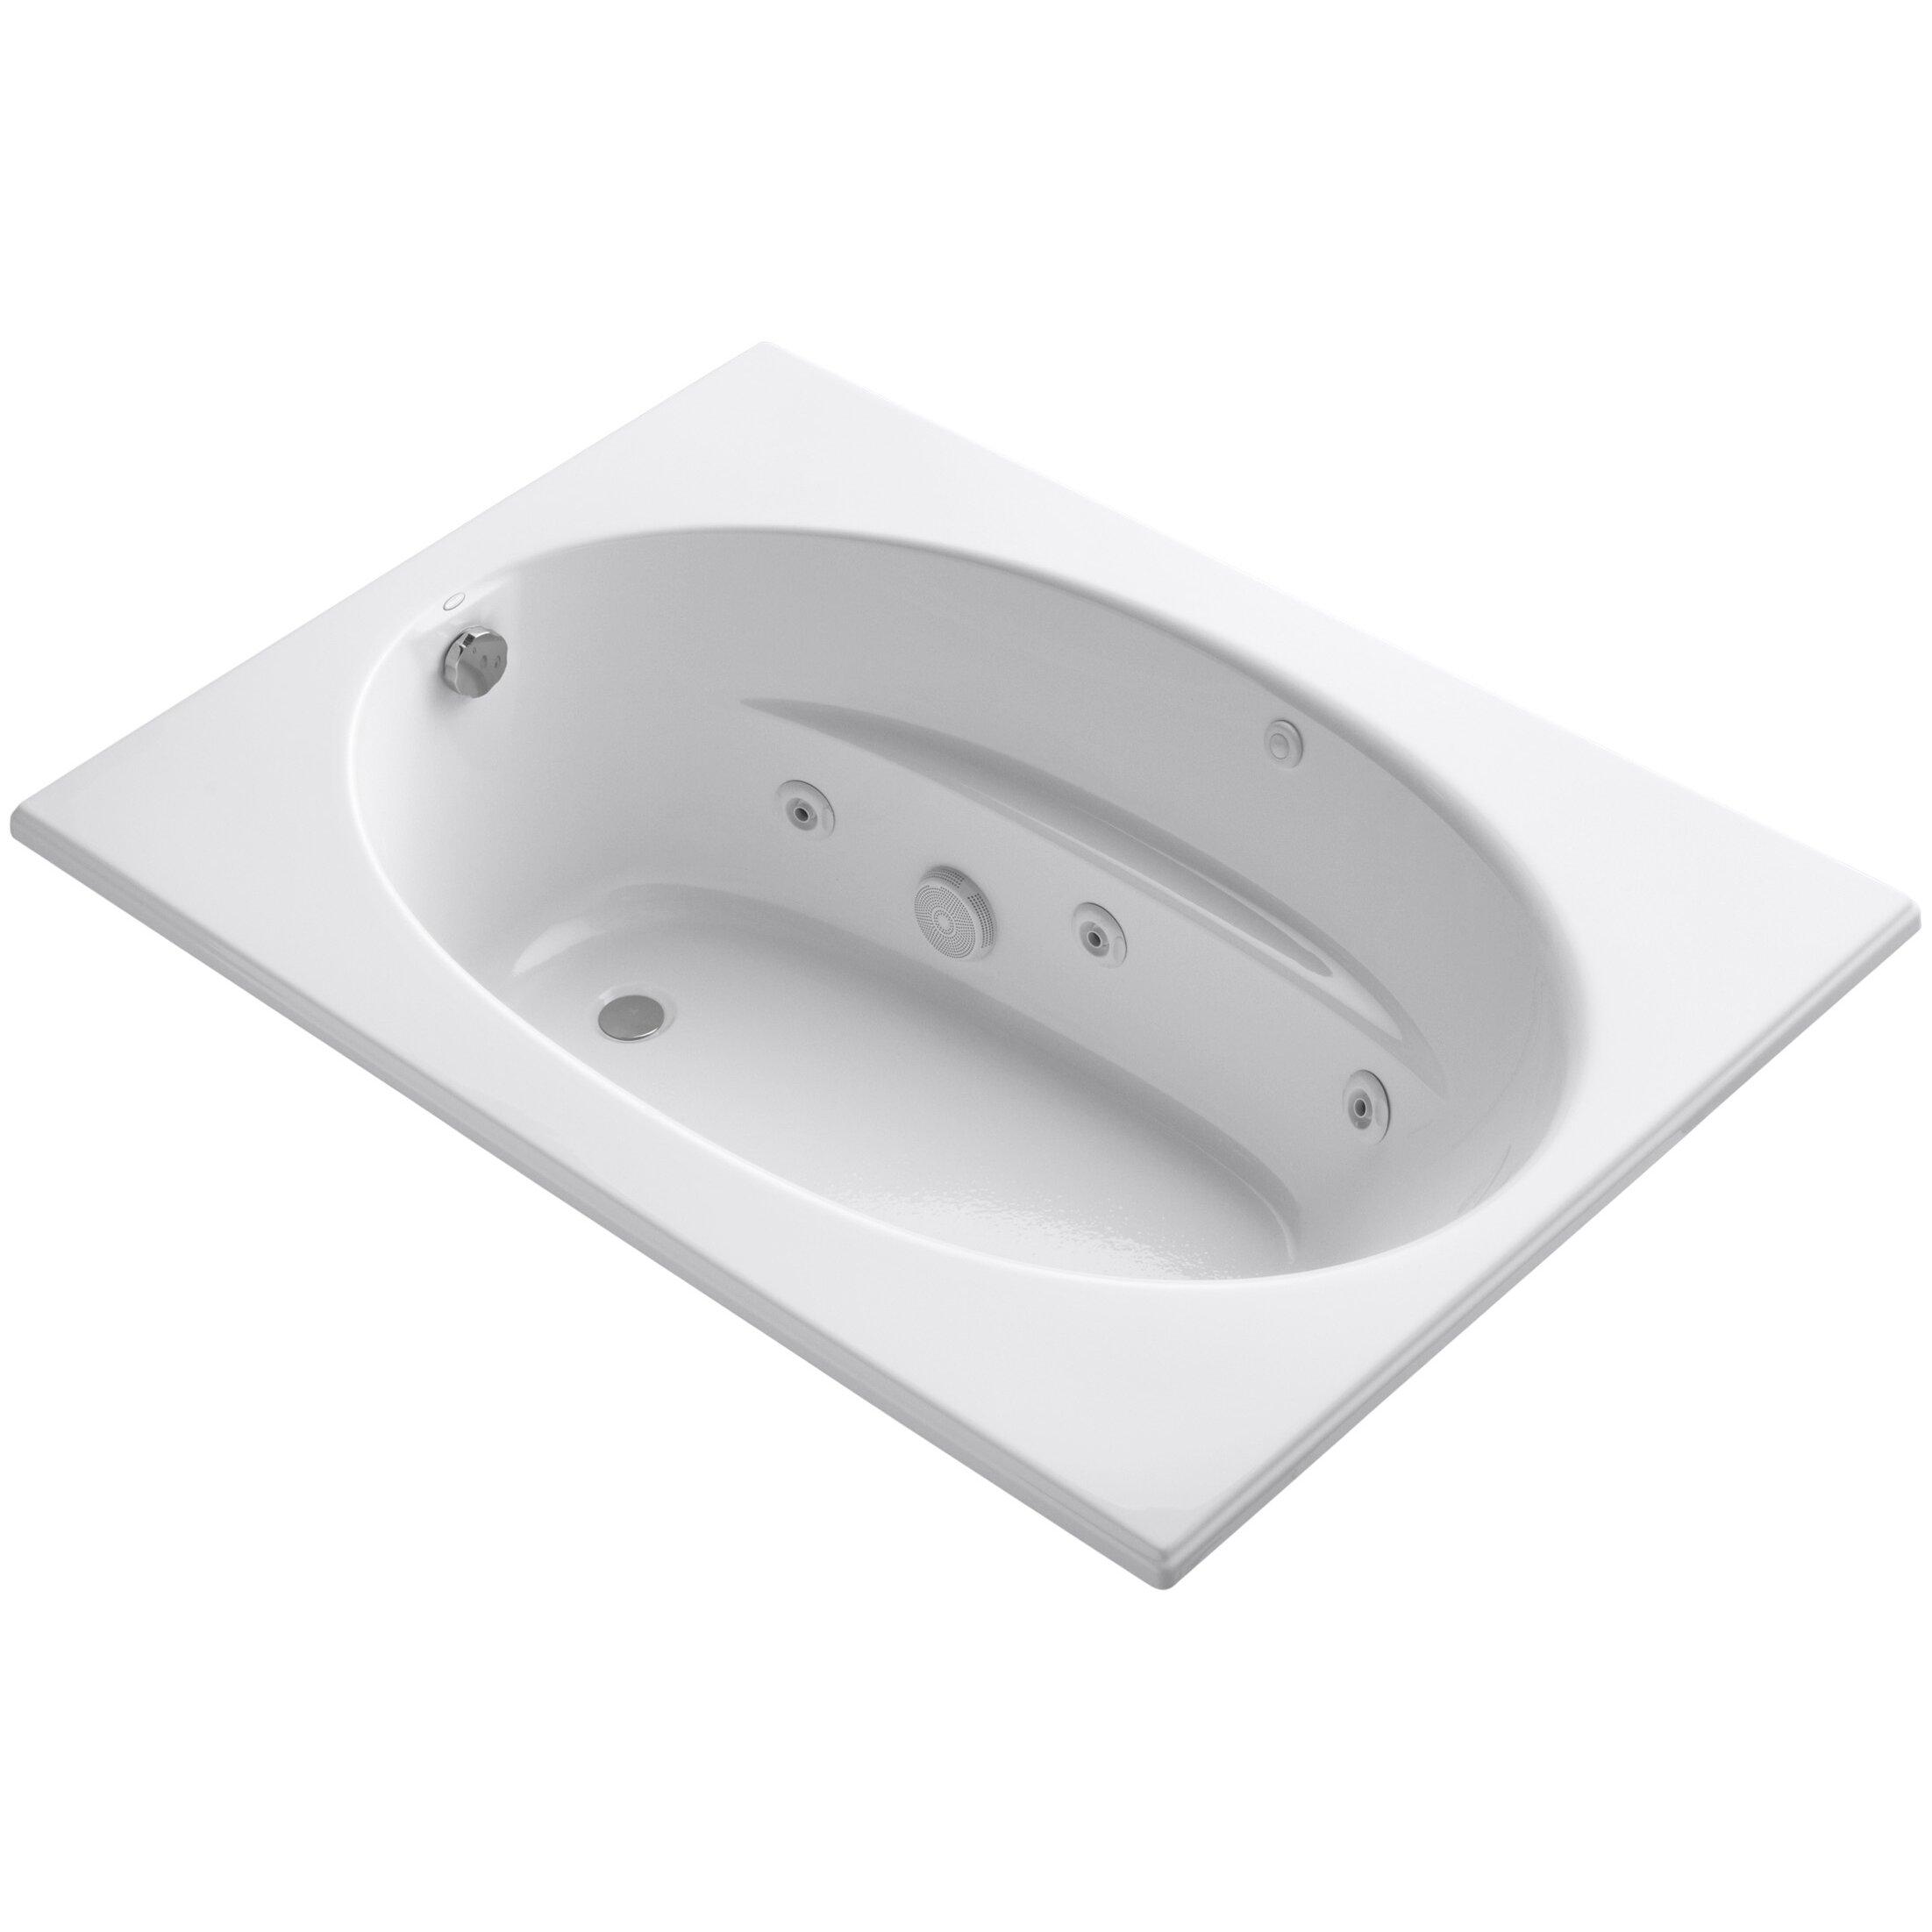 60 X 42 Bathtub Kohler Windward 60 Quot X 42 Quot Whirlpool Bathtub Wayfair